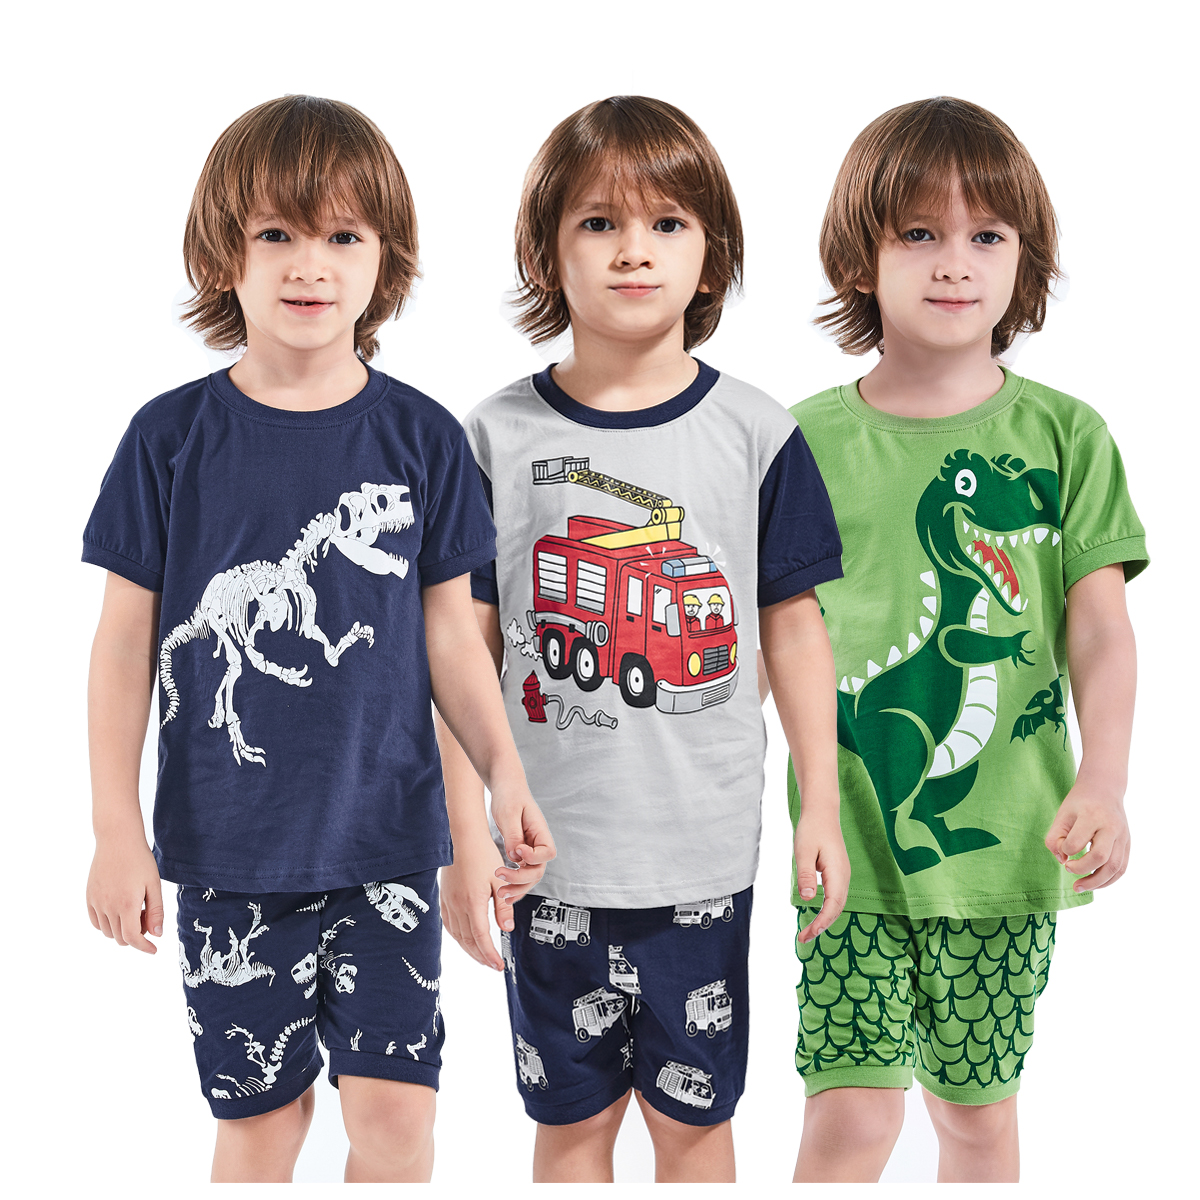 Boy Summer Pajamas Children's Halloween Pirate Sleepwear Set Kids Dinosaur Football Cartoon Nightwear Toddler Soccer Homewear